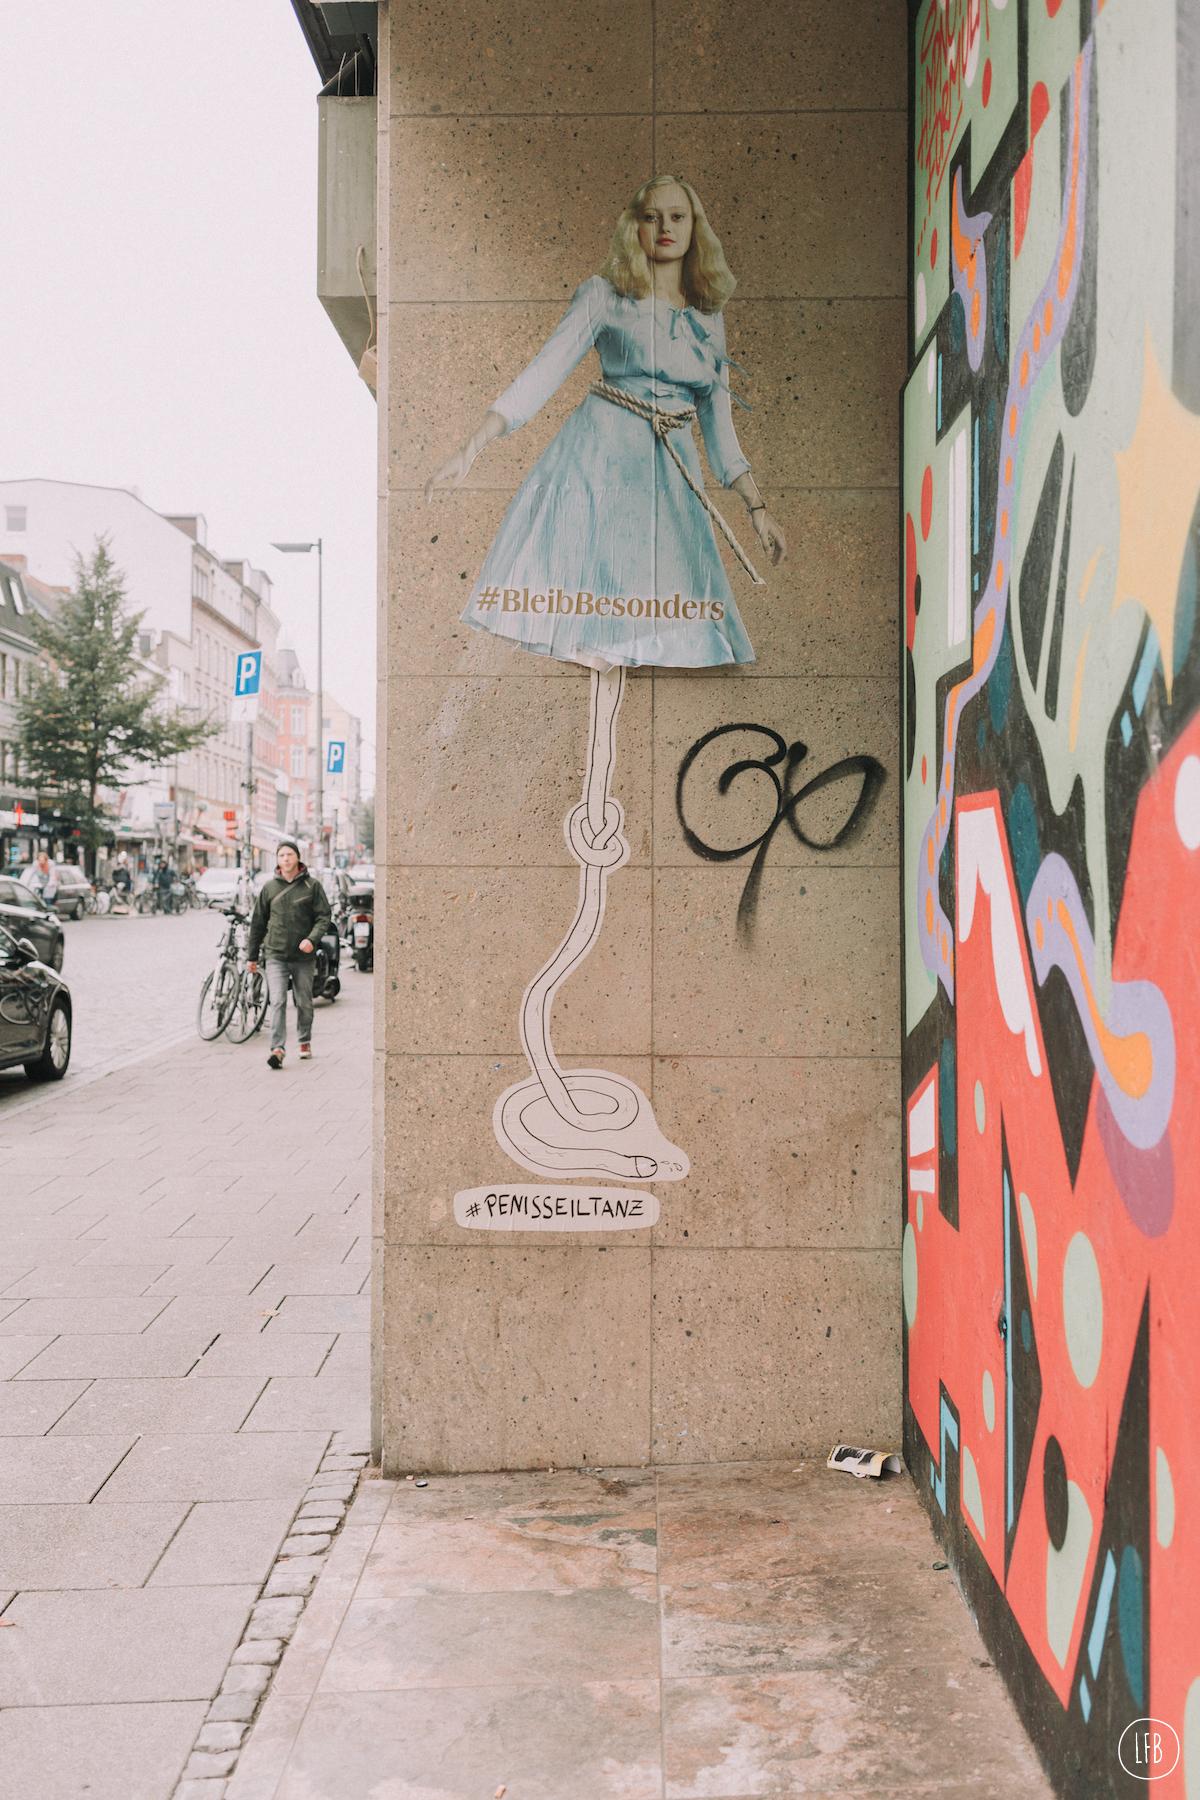 Hamburg Street Photography - lovefromberlin.net - photographer: Rae Tashman